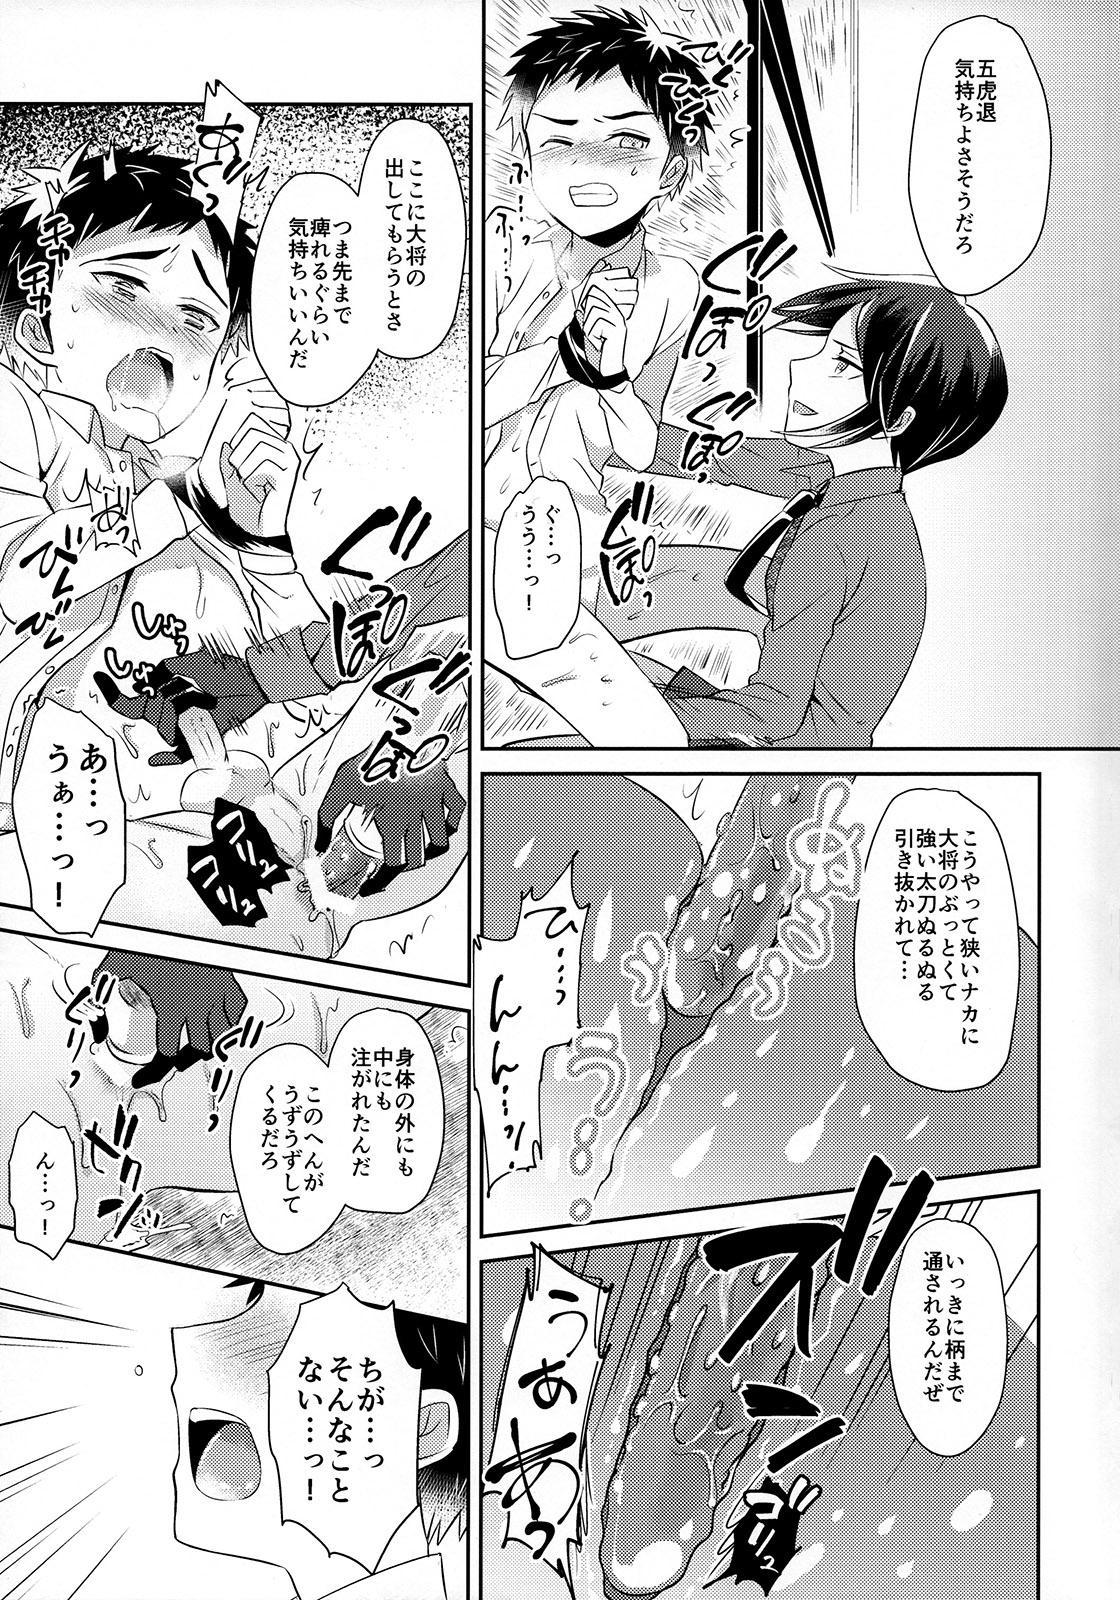 Awataguchi wa Saikou daze! 23